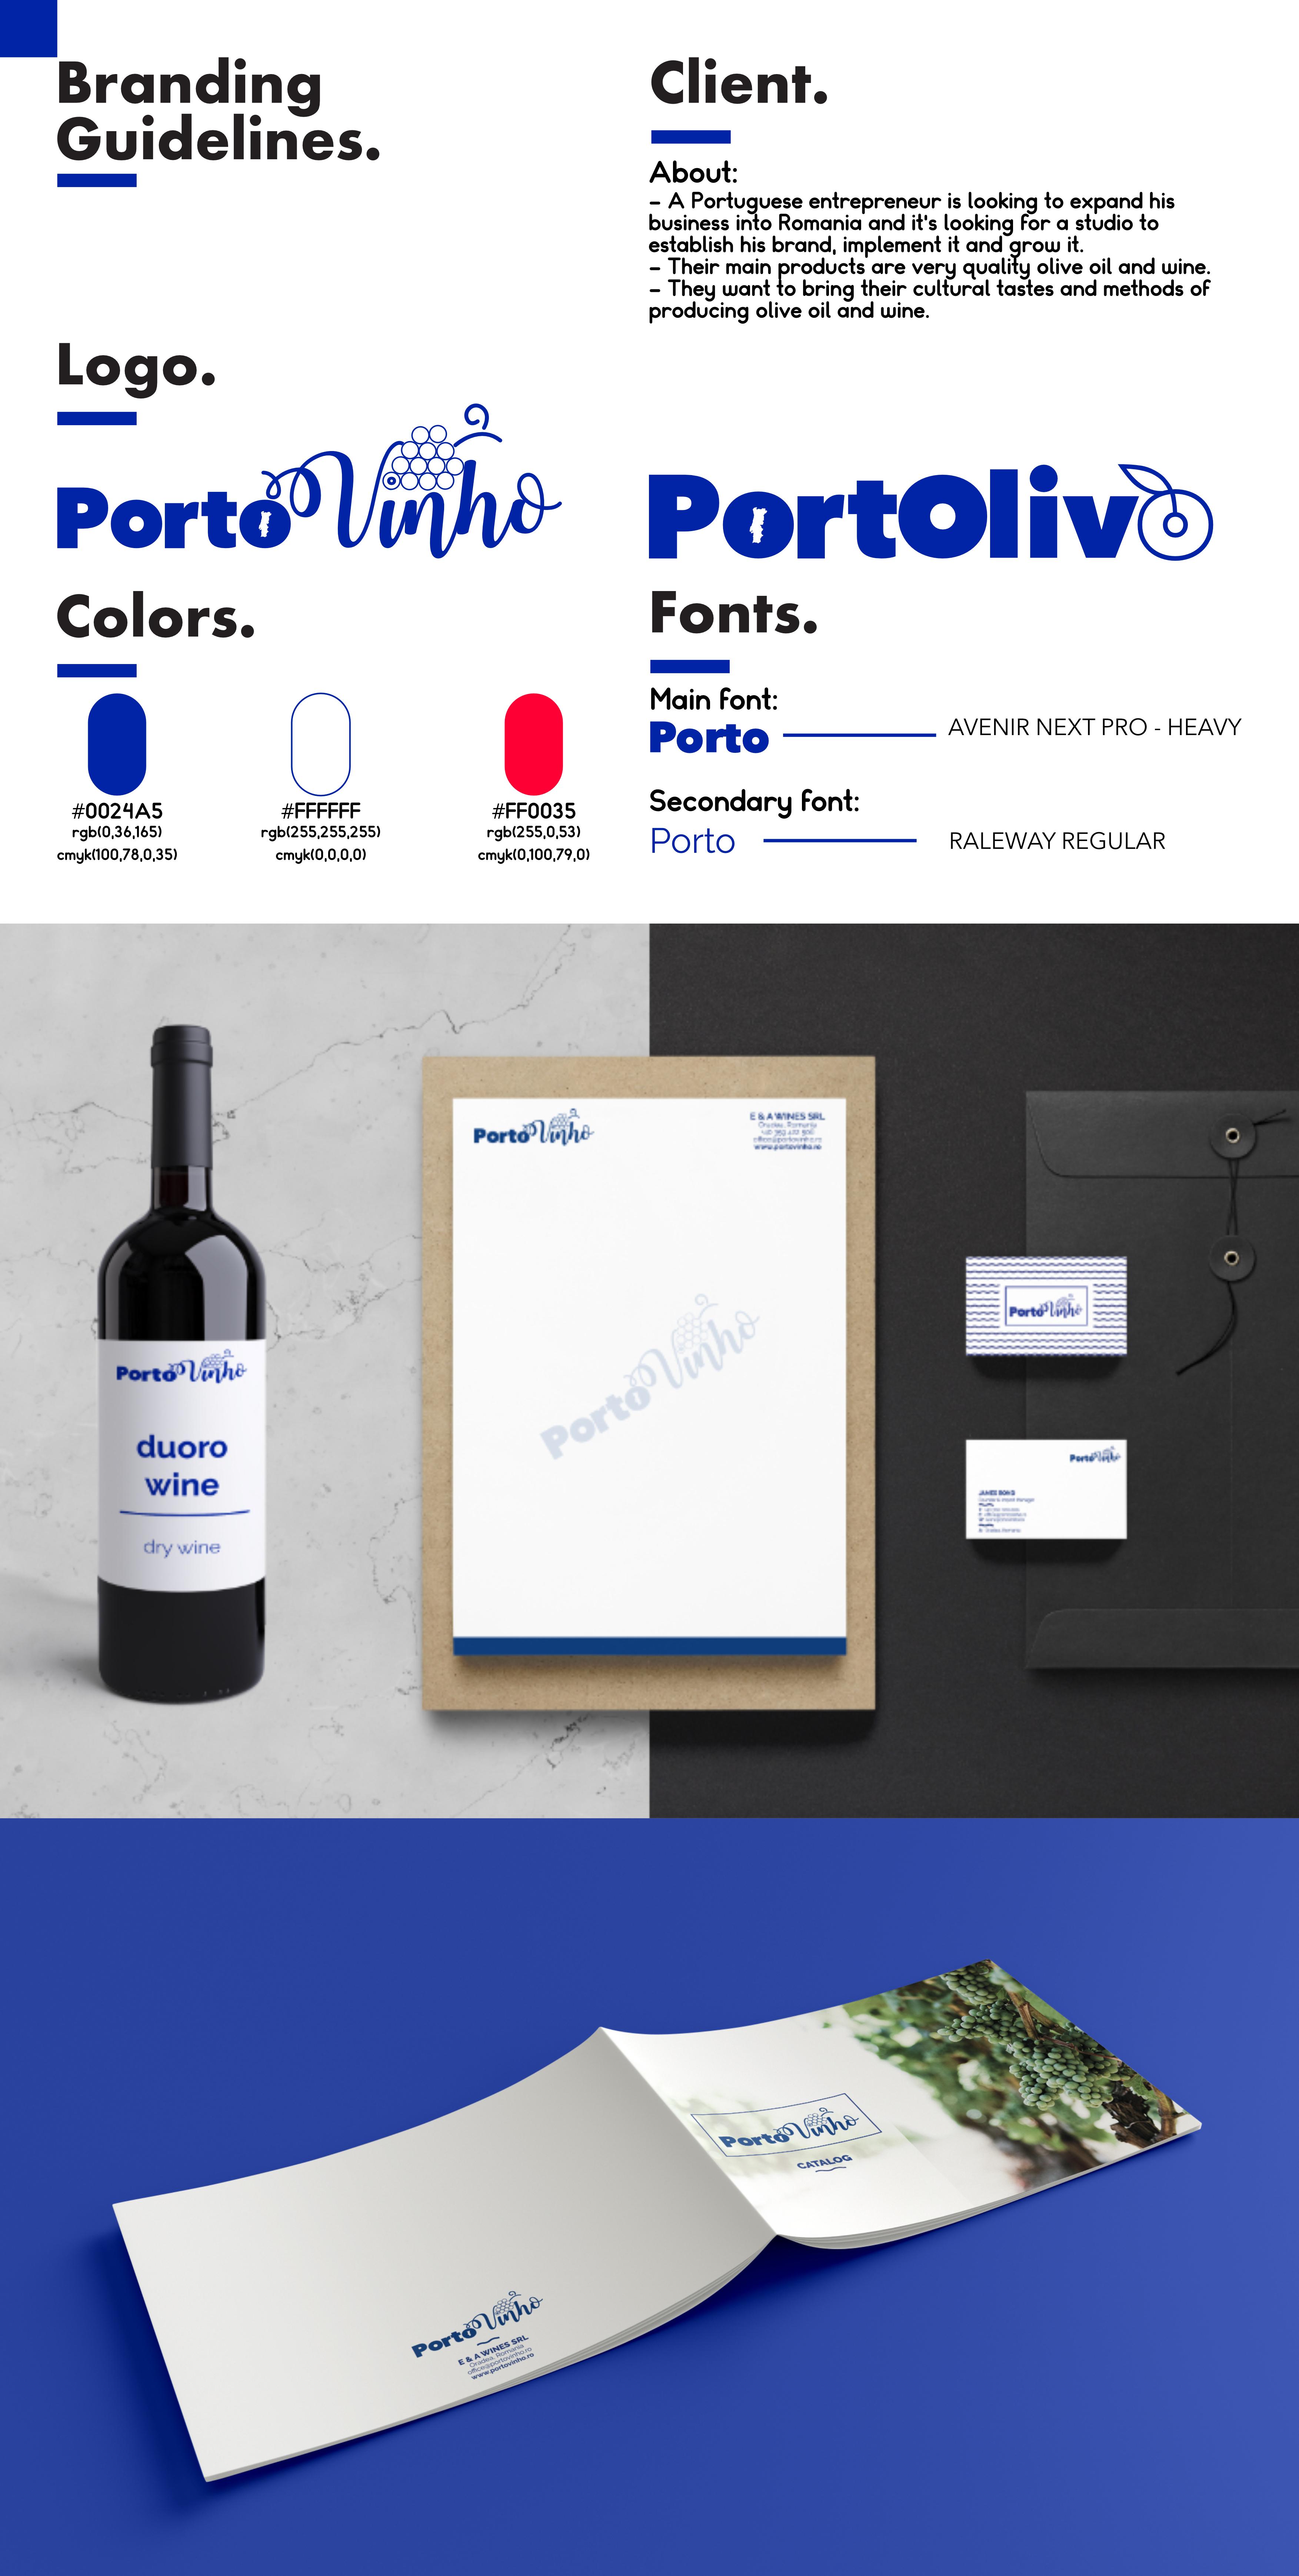 porto_branding_guideline